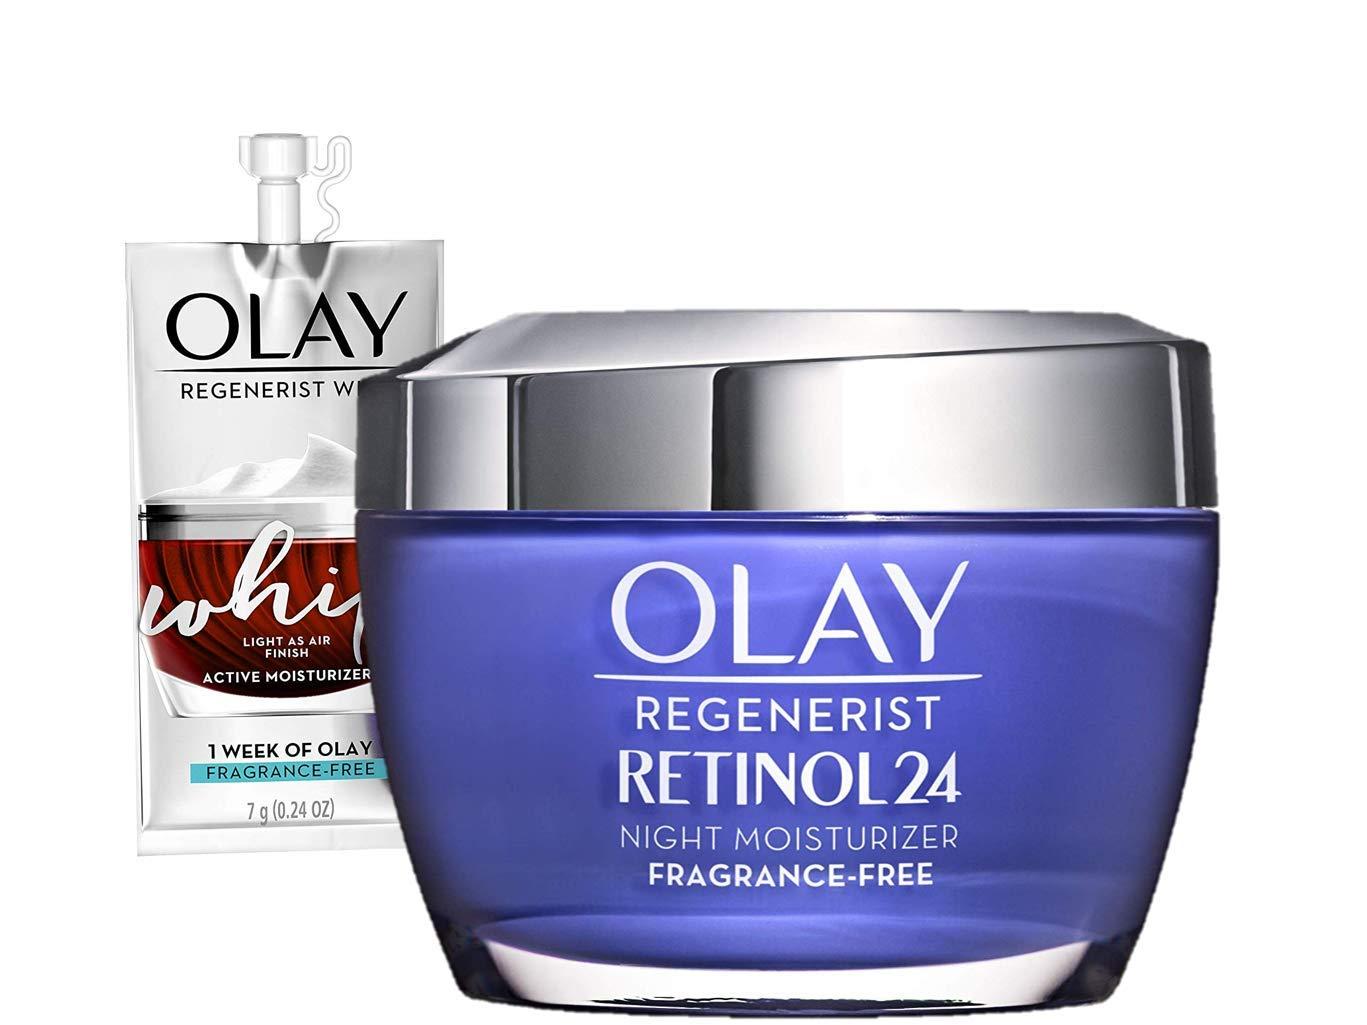 Retinol Moisturizer By Olay, Retinol 24 Night Face Cream, 1.7oz + 1 Week Of Whip Face Moisturizer Travel/Trial Size by Olay